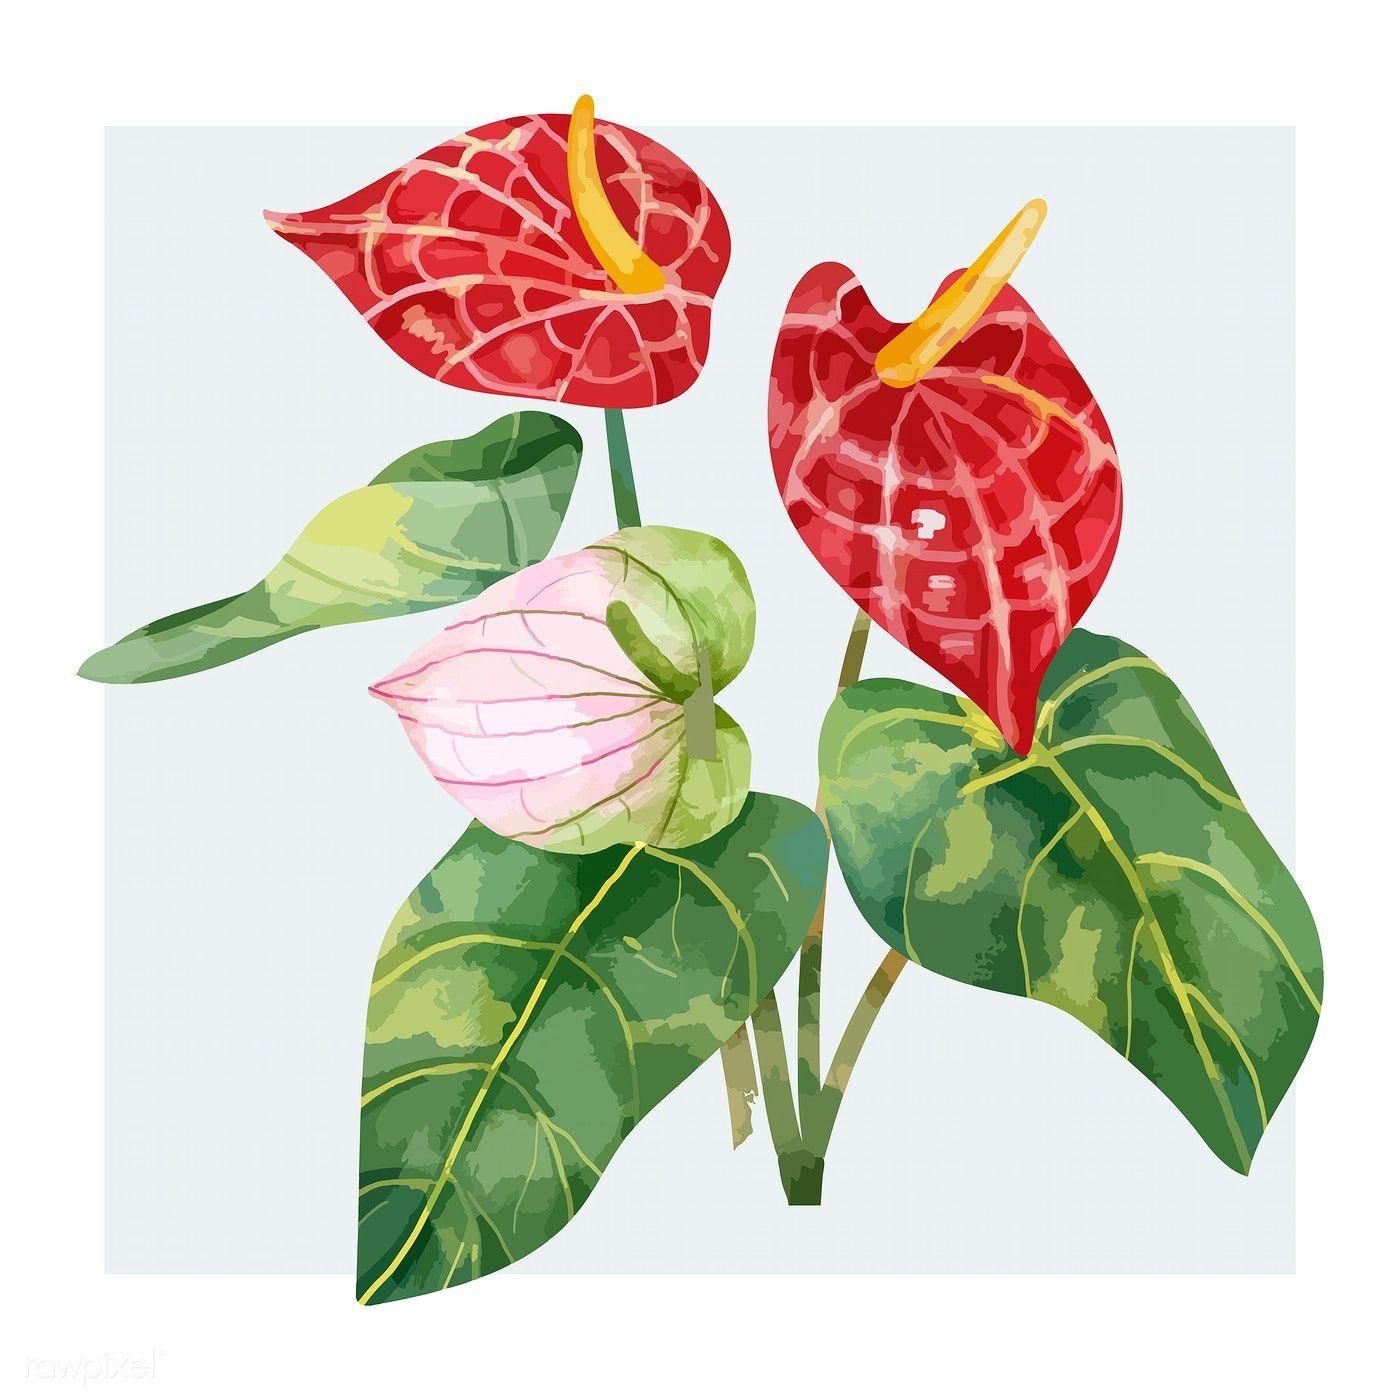 Download Premium Vector Of Hand Drawn Red Laceleaf Flower 421534 How To Draw Hands Illustration Flower Illustration